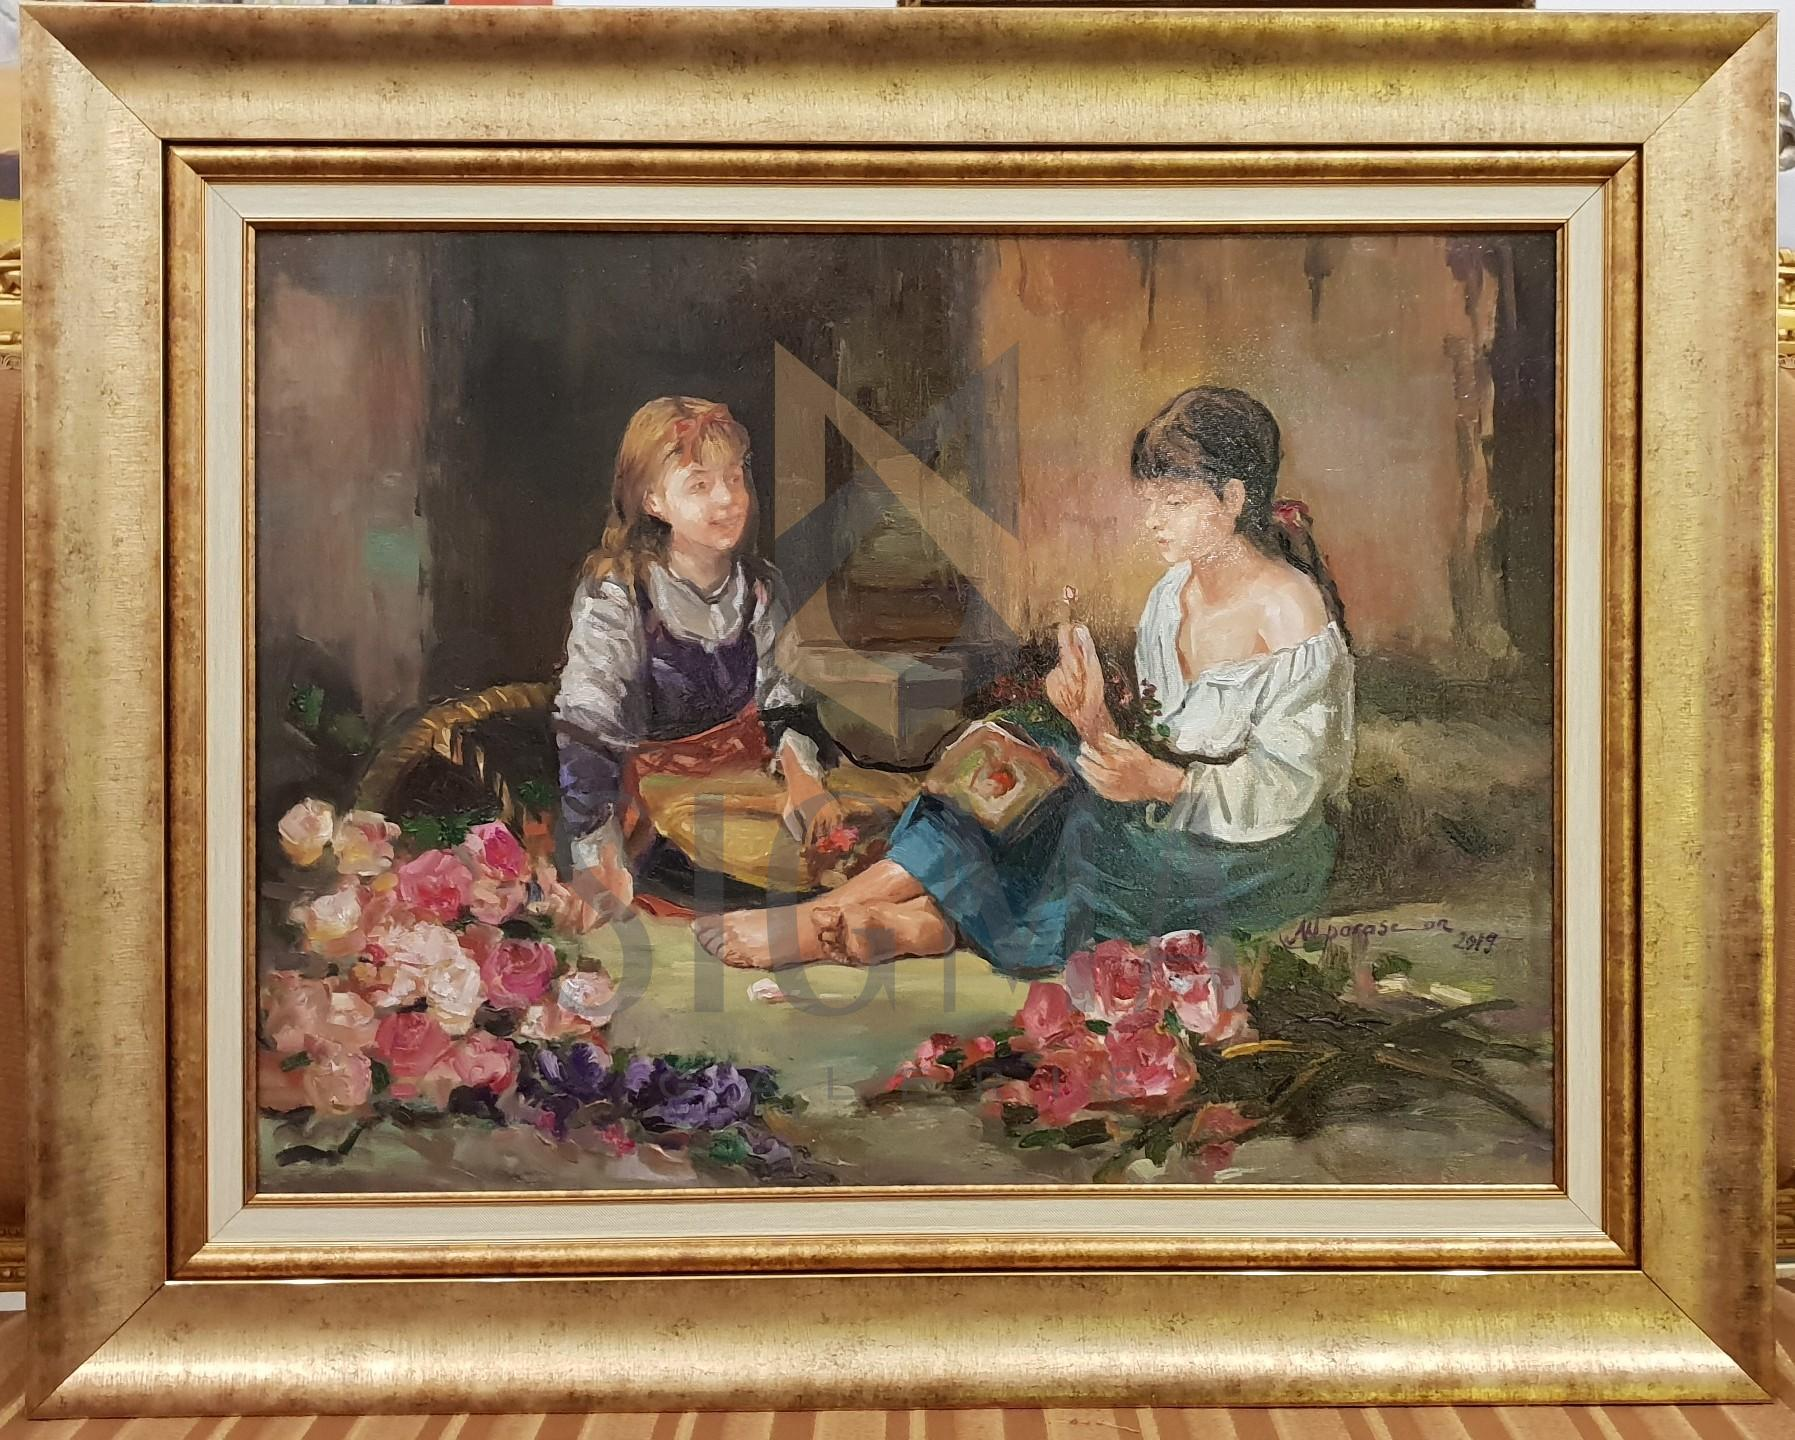 "Tablou, Maria Parascan, ""Fetitele cu cosul de flori"", datat 2019, dim 52 x 70 cm"